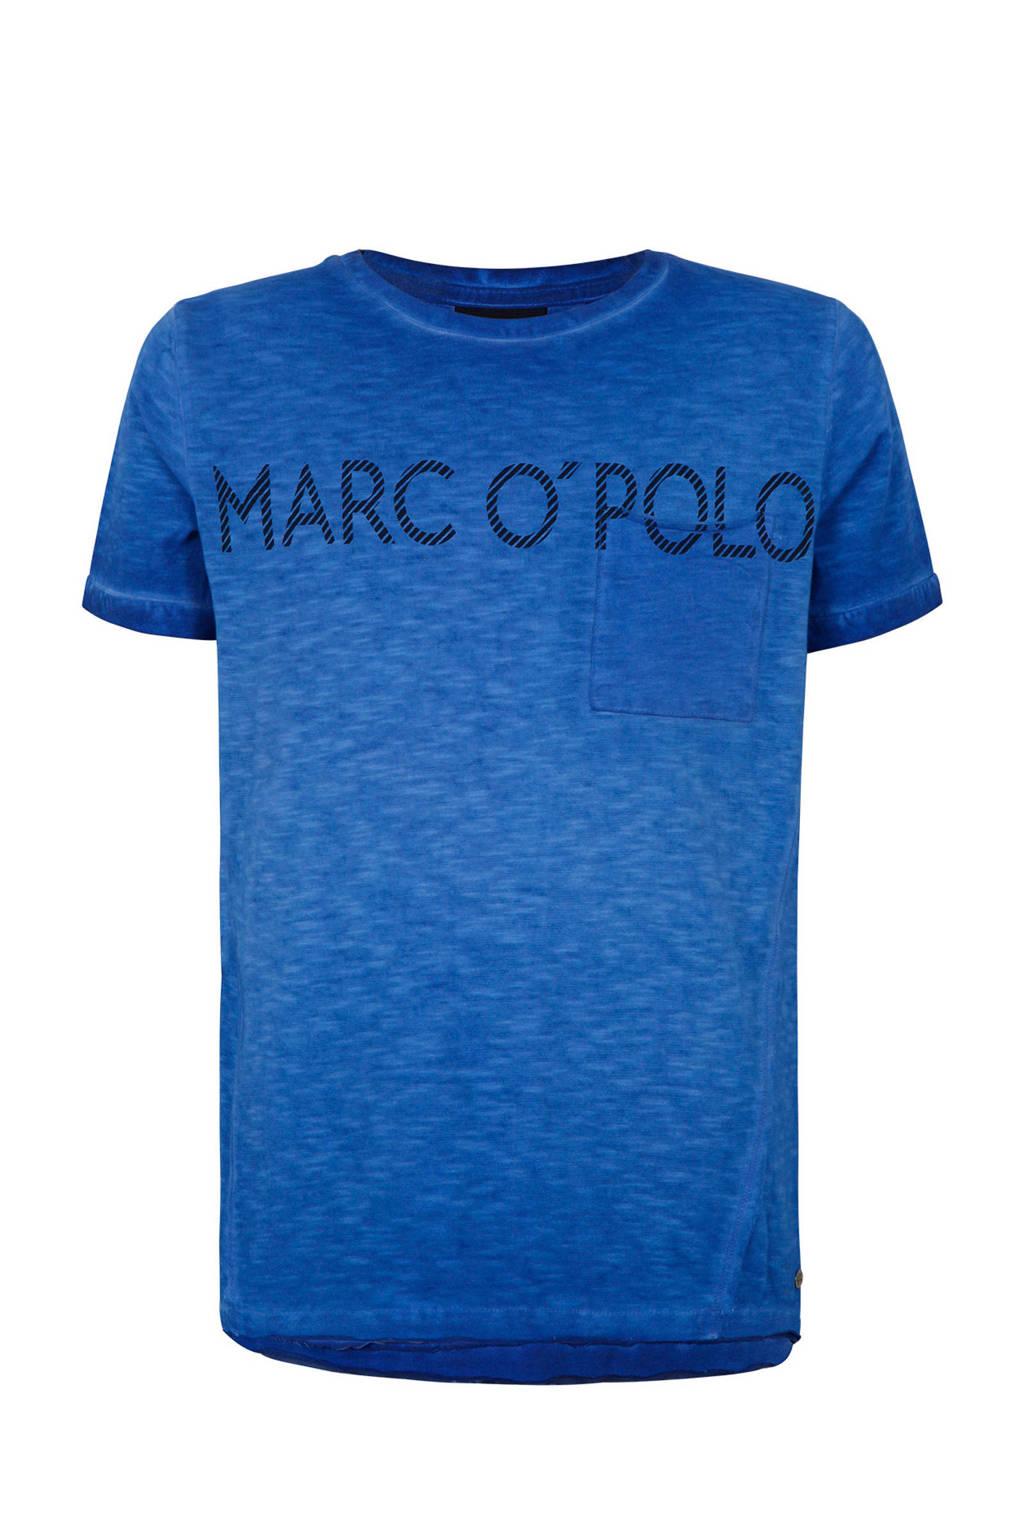 Marc O'Polo T-shirt met logo blauw, Blauw